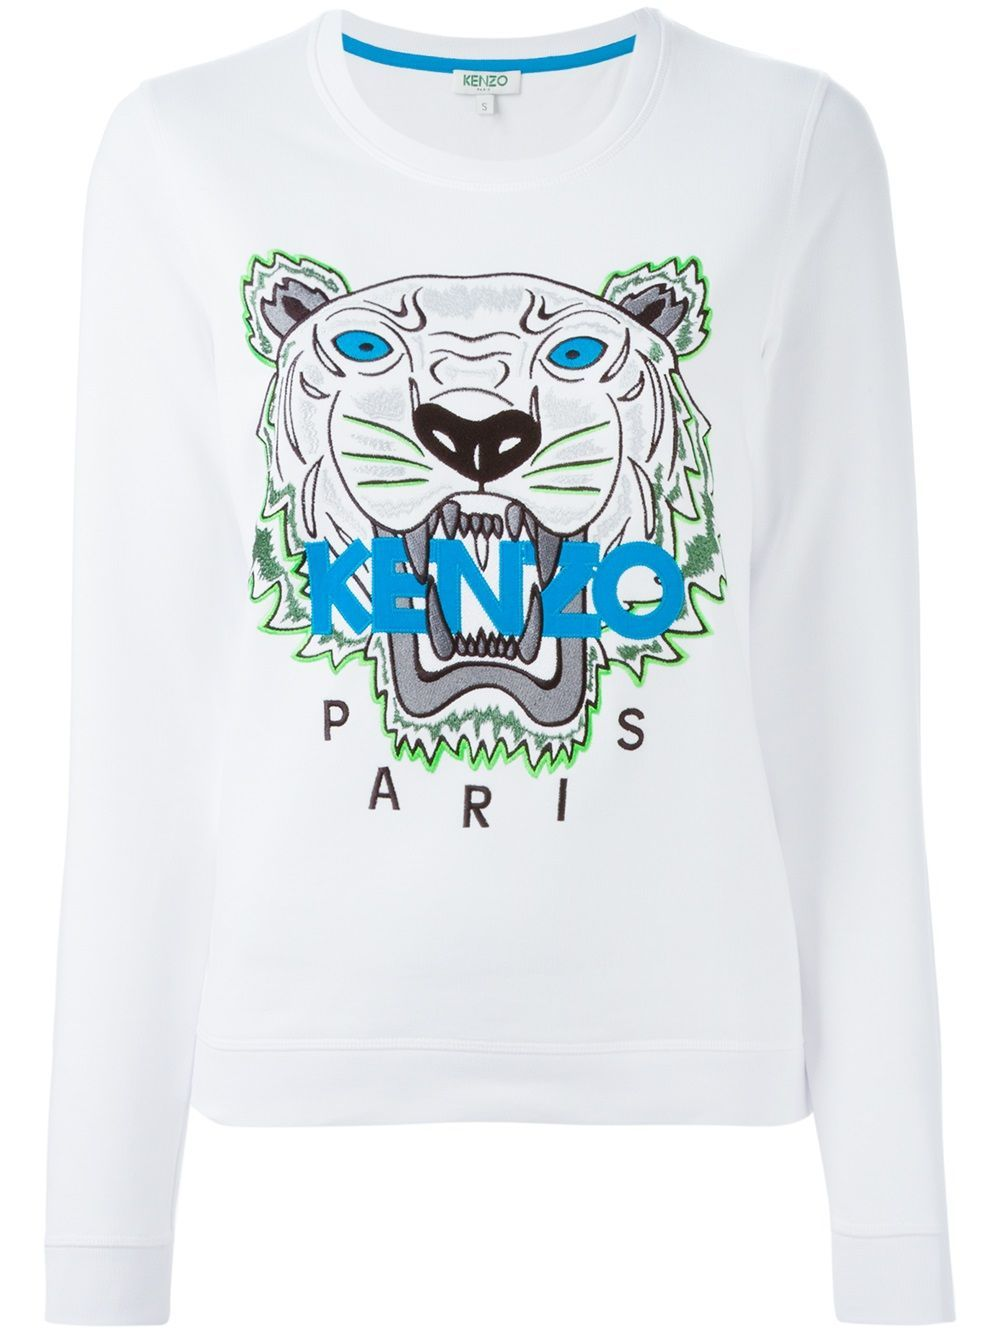 Kenzo Tiger Sweatshirt Farfetch Kenzo Tiger Sweatshirt Tiger Sweatshirt Sweatshirts [ 1334 x 1000 Pixel ]